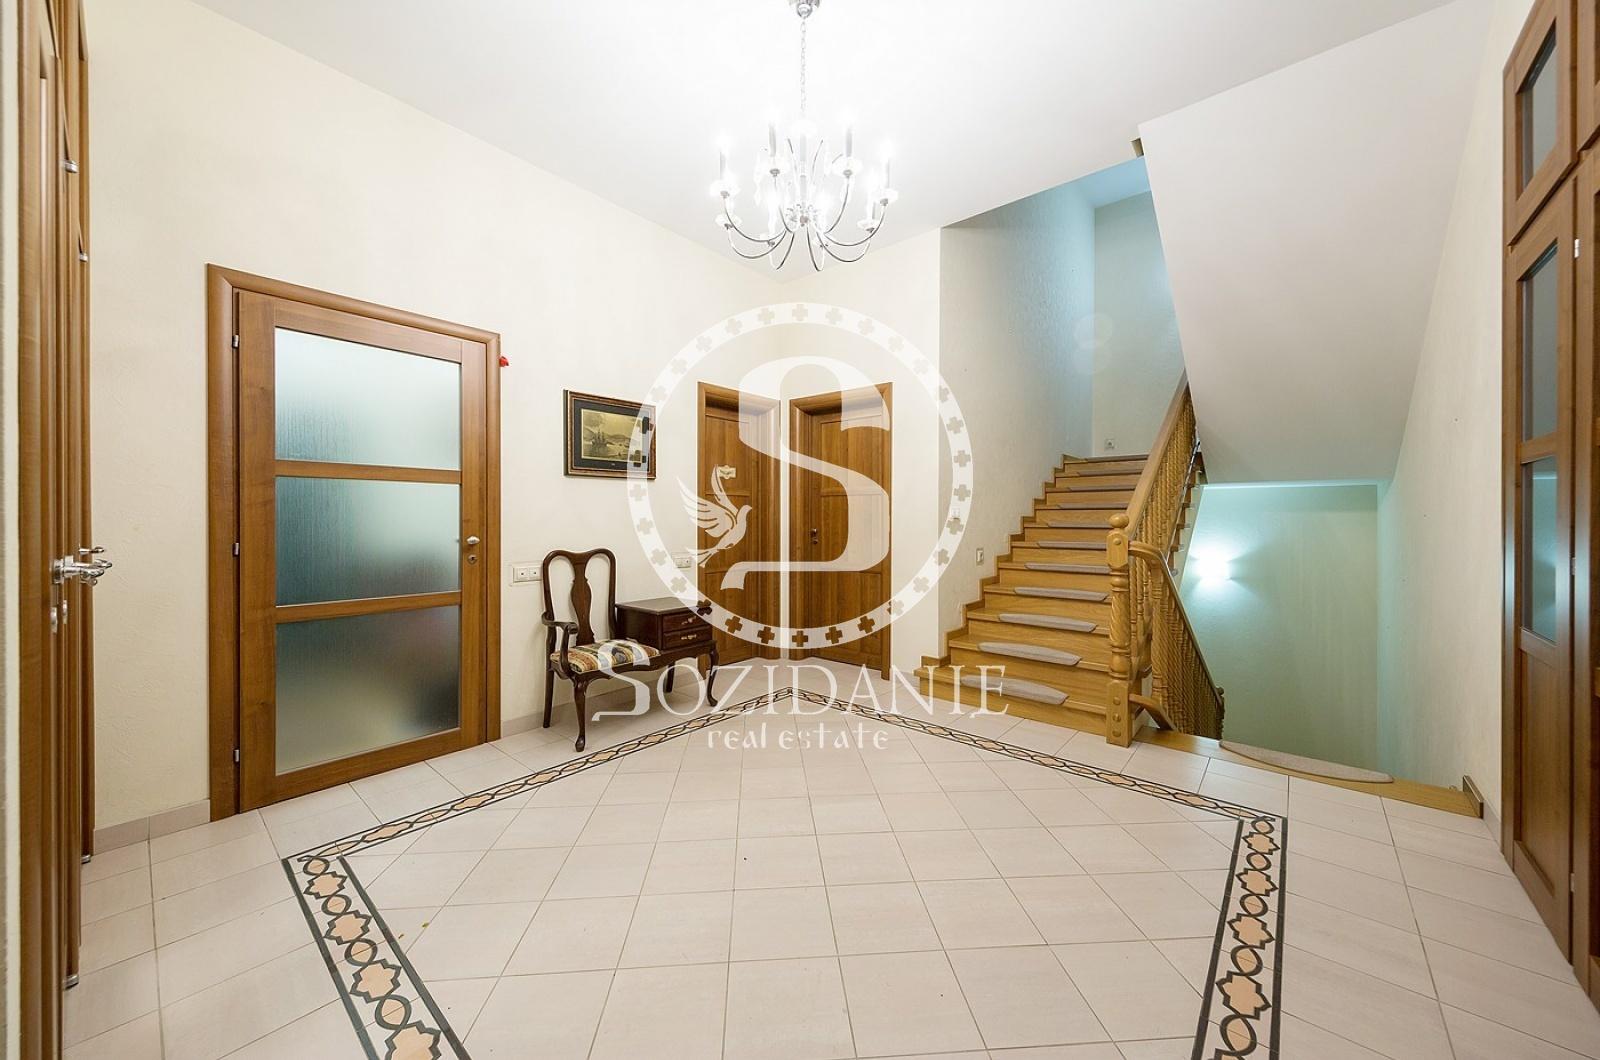 8 Комнаты, Городская, Продажа, Улица Береговая, Listing ID 3538, Москва, Россия,